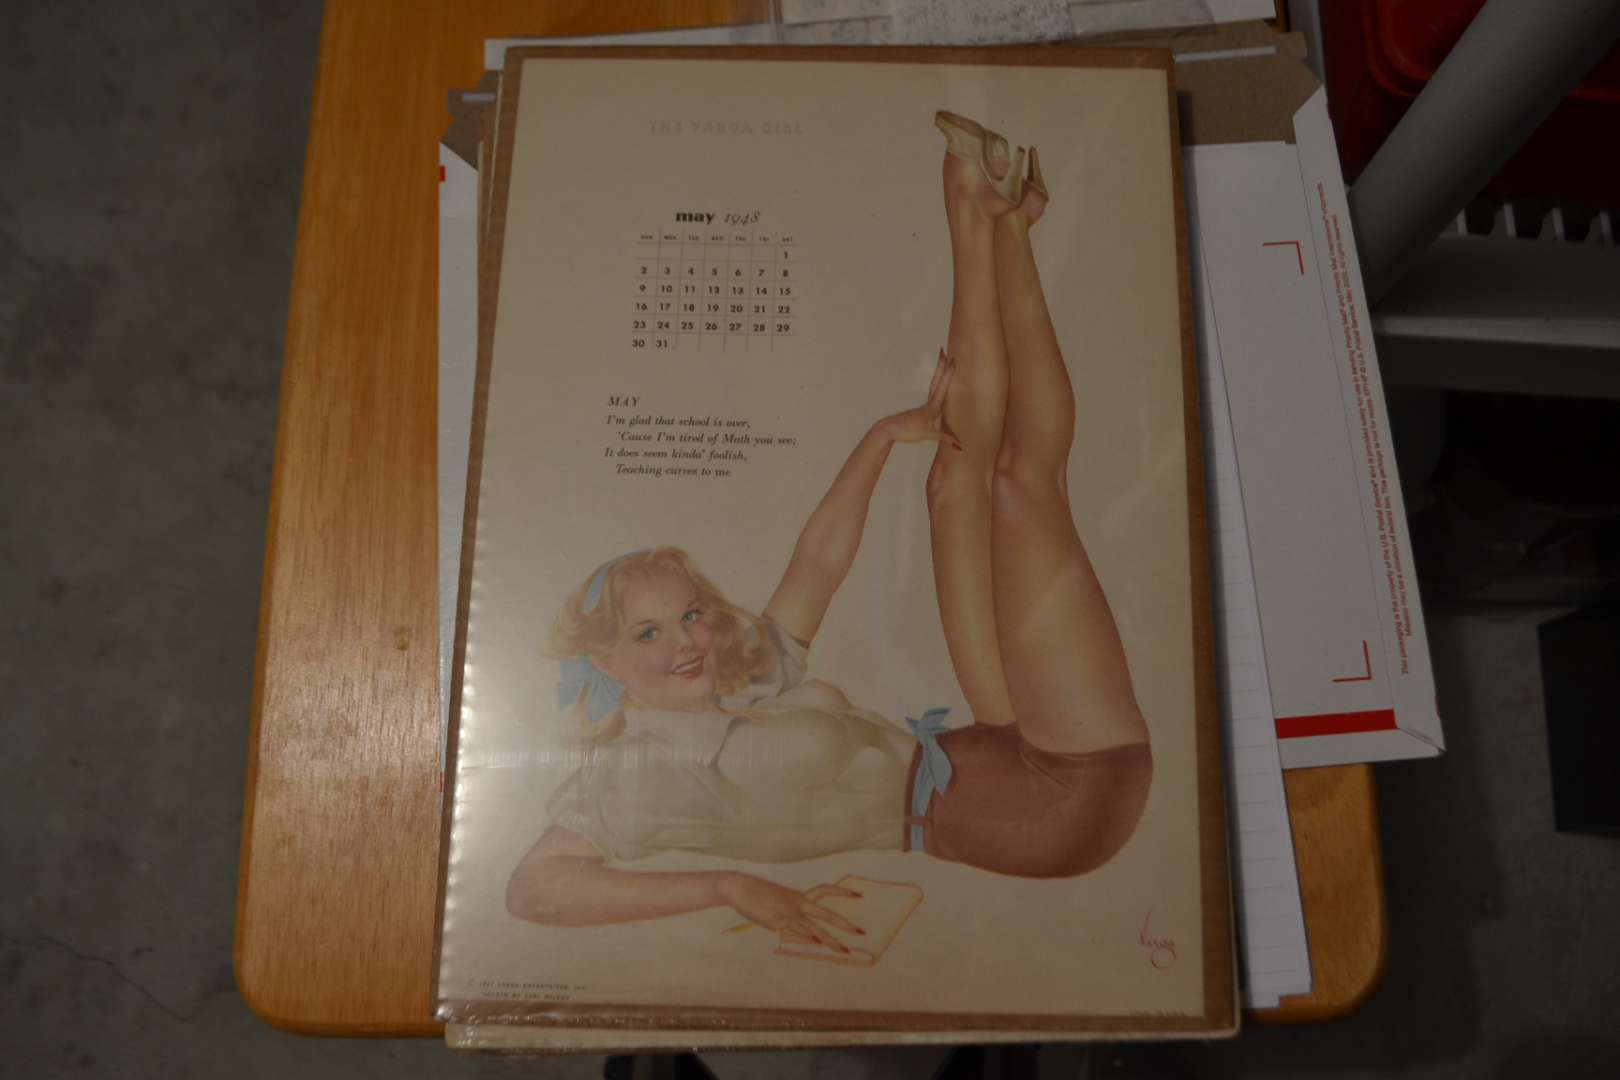 Lot # 141 VINTAGE VARGA GIRL MAY 1948